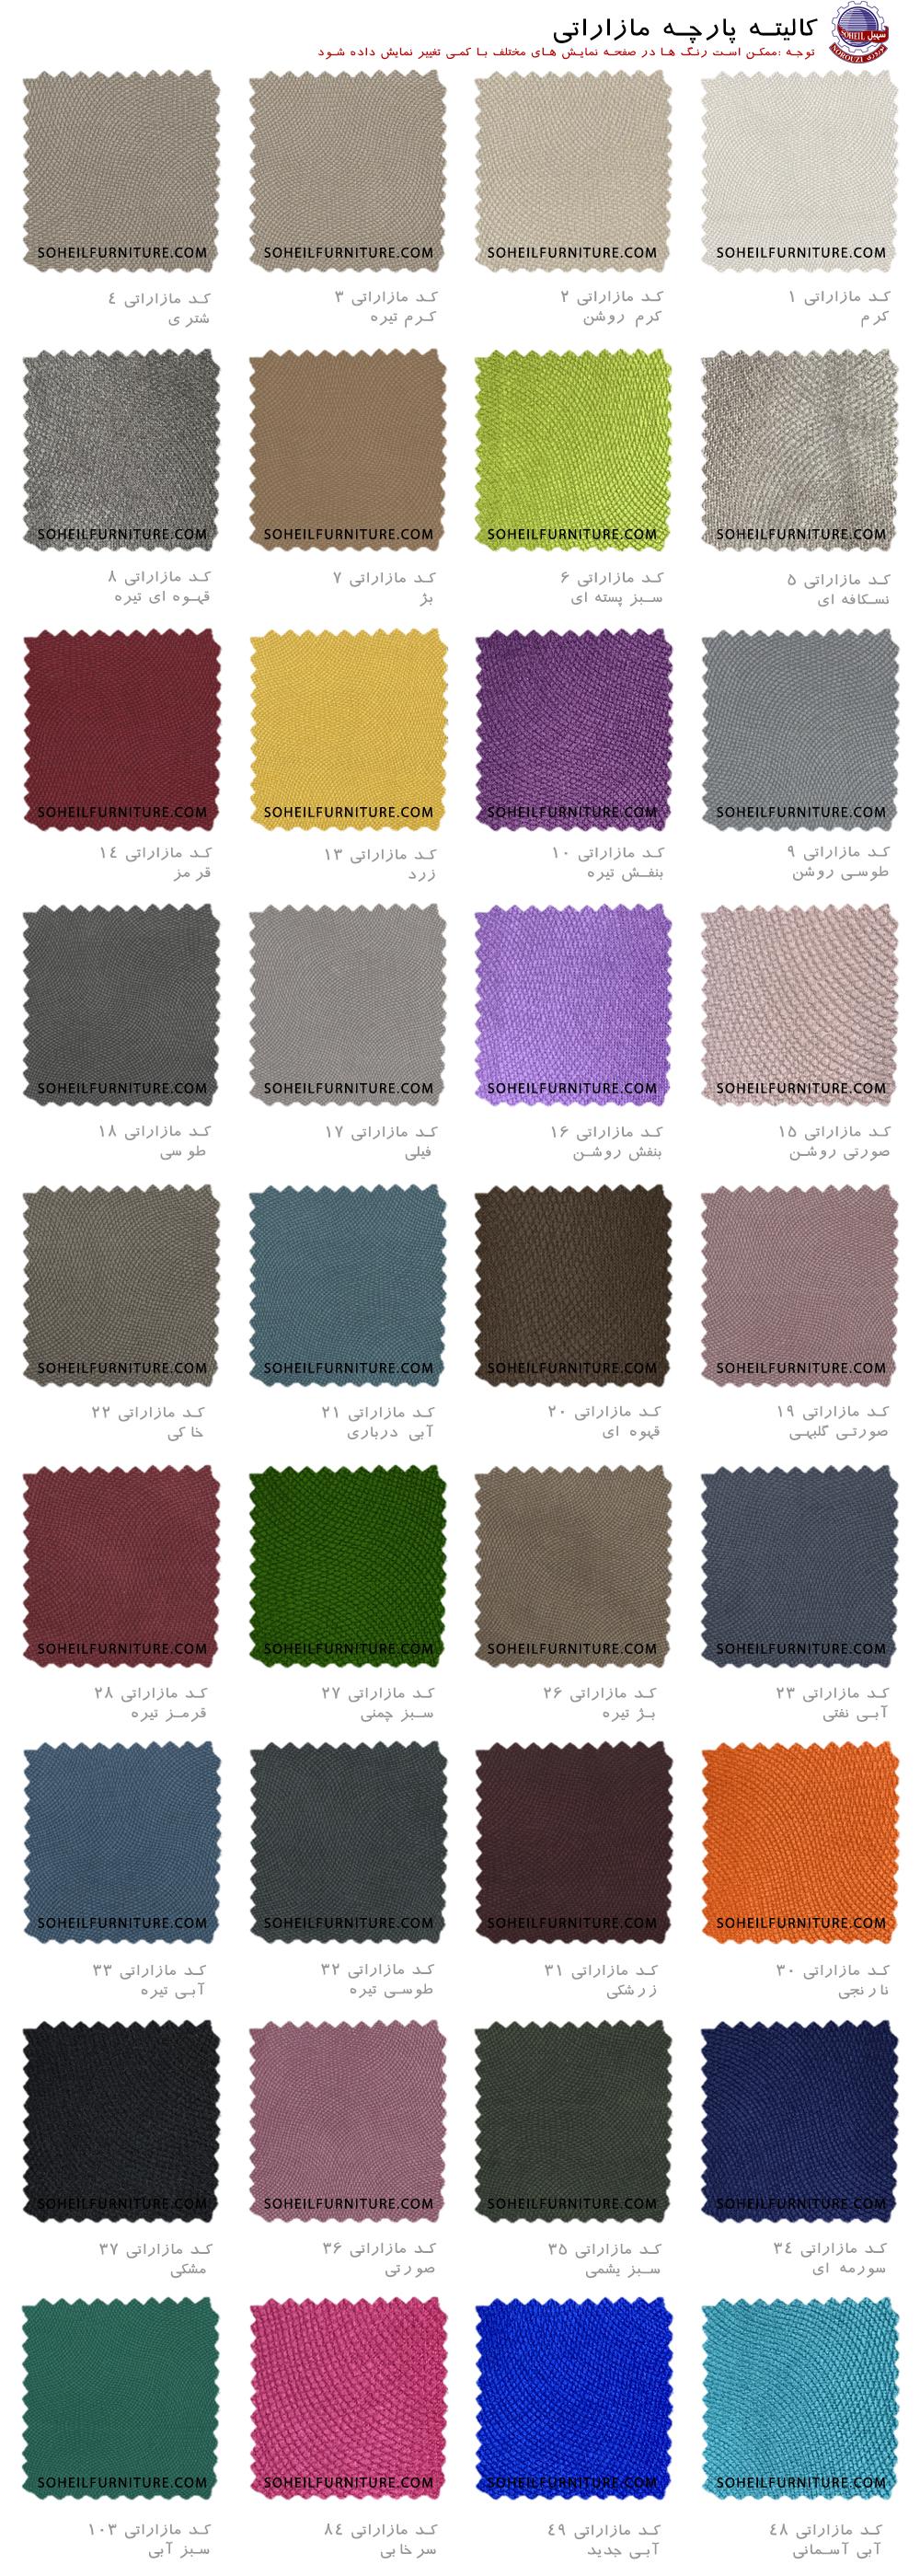 masarati color fabric - باکس یاشار سهیل